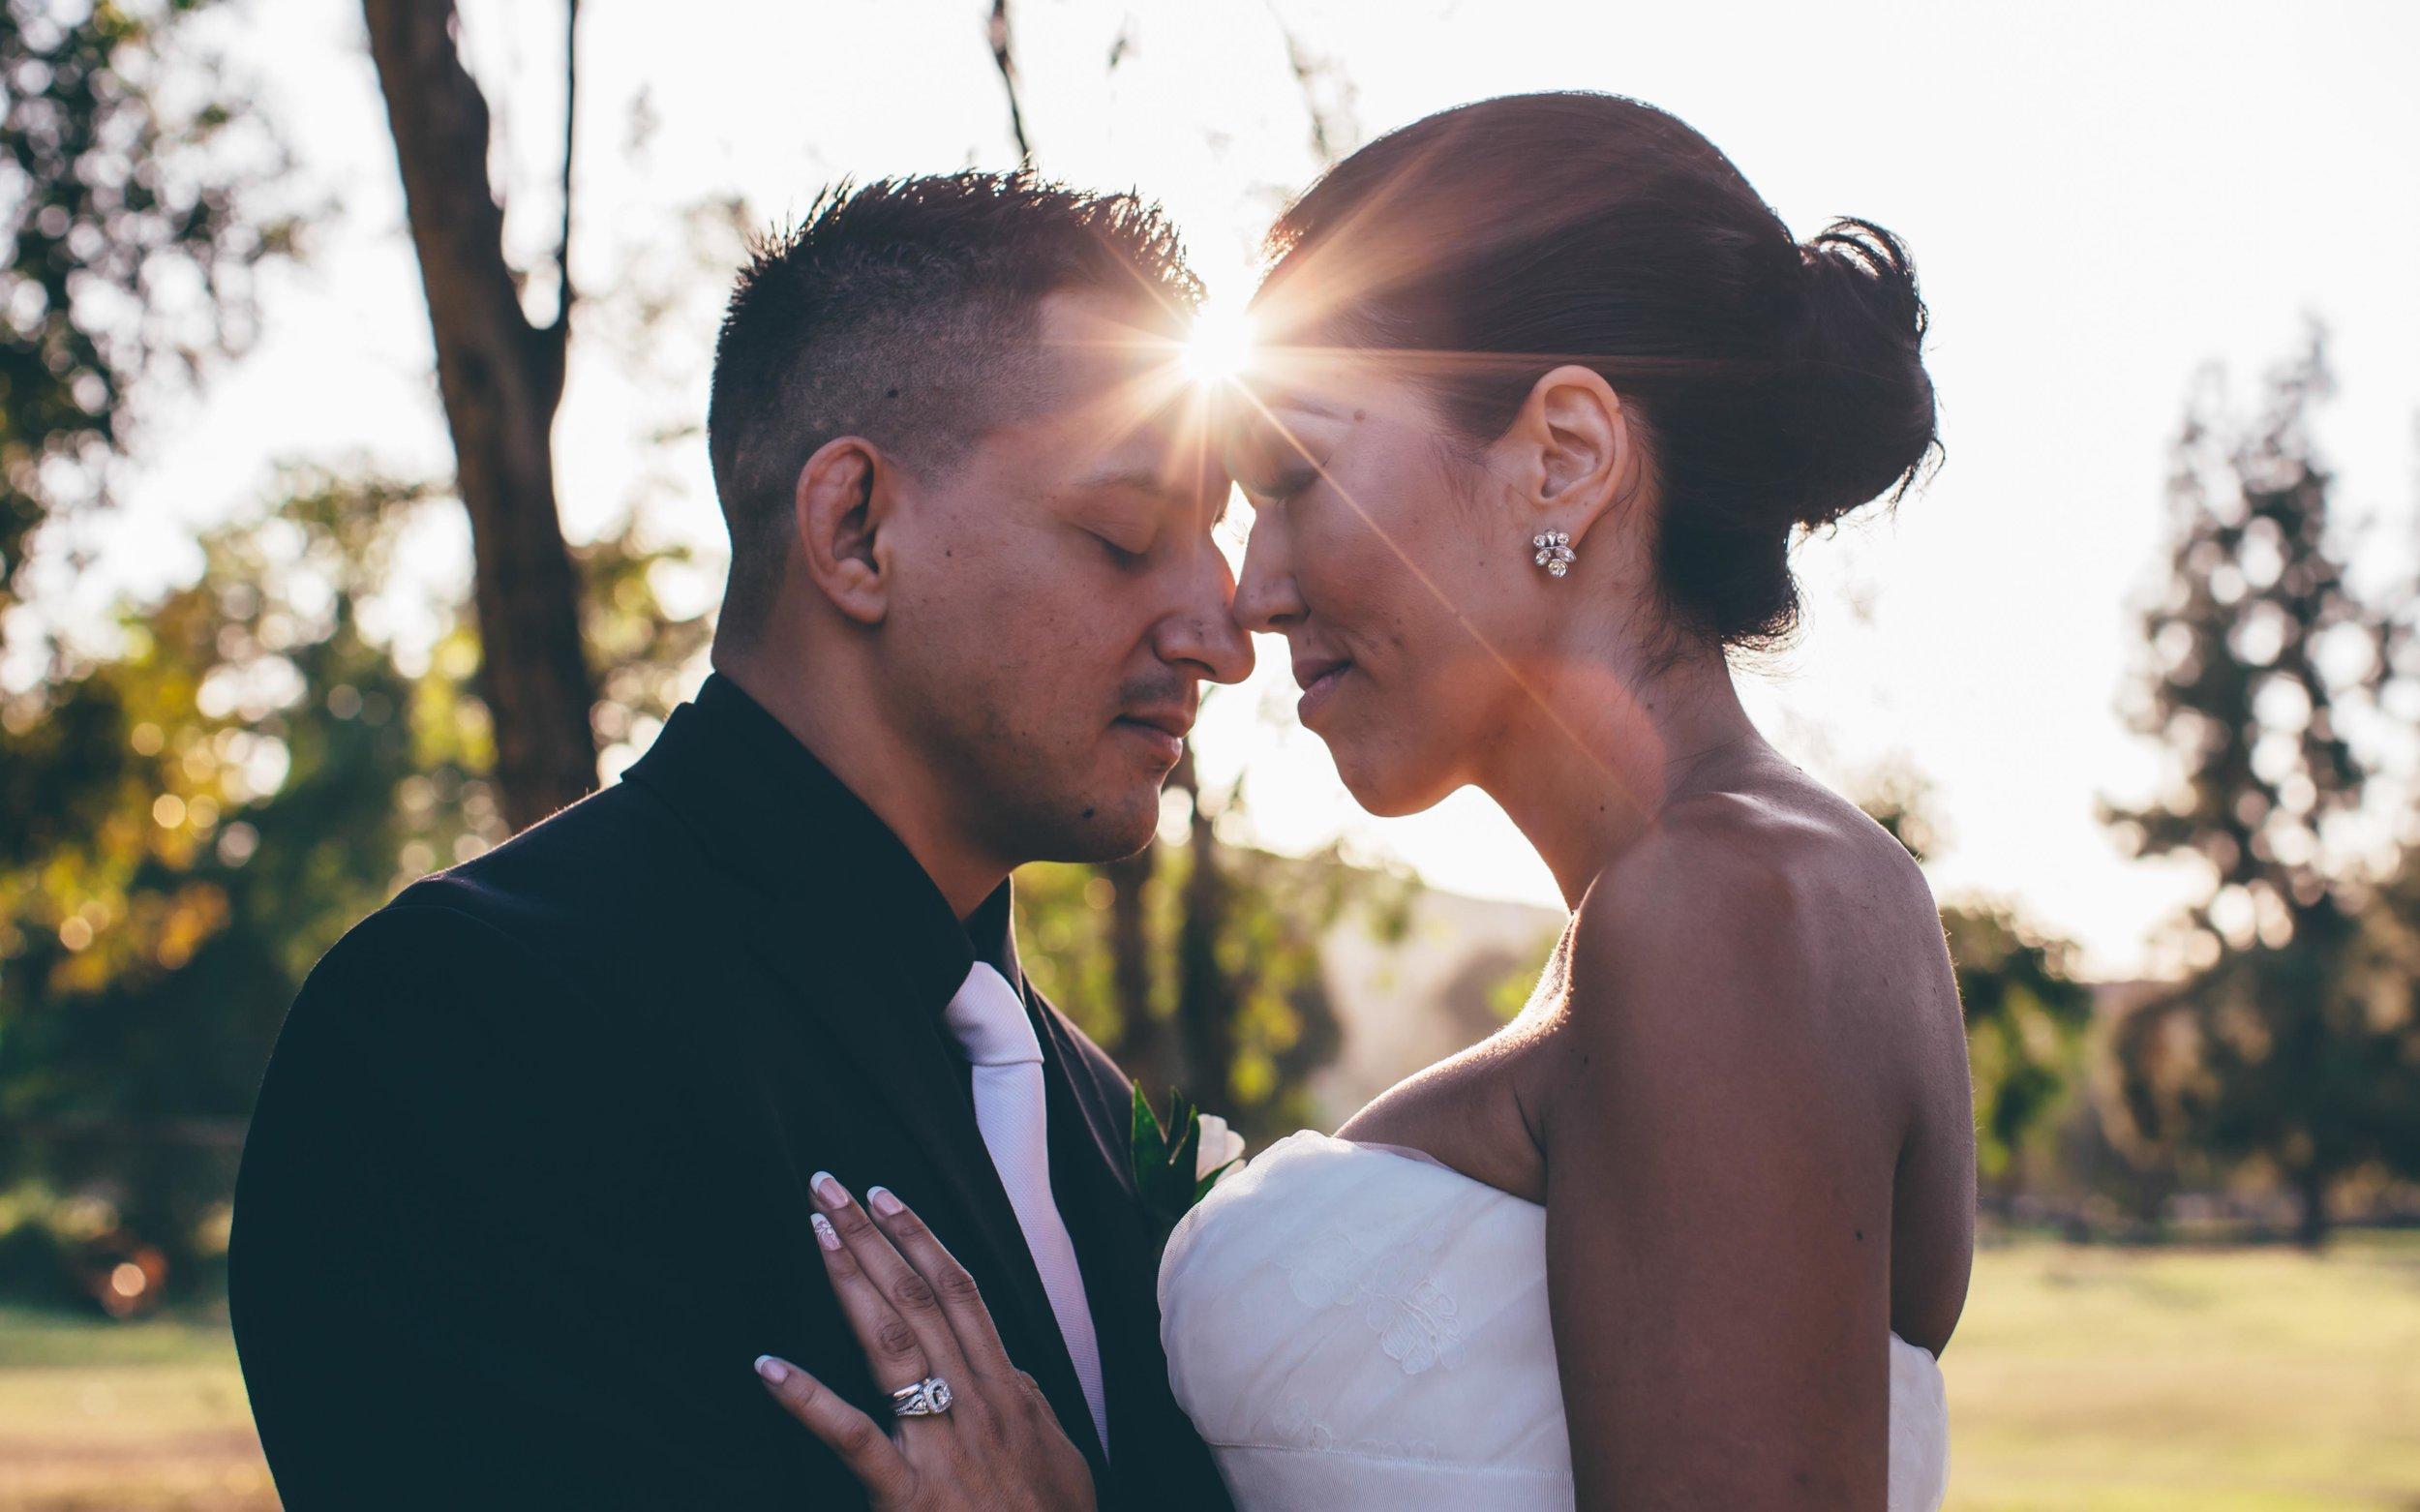 APavone-Photographer-Orange-County-Diamond-Bar-Wedding-075.jpg